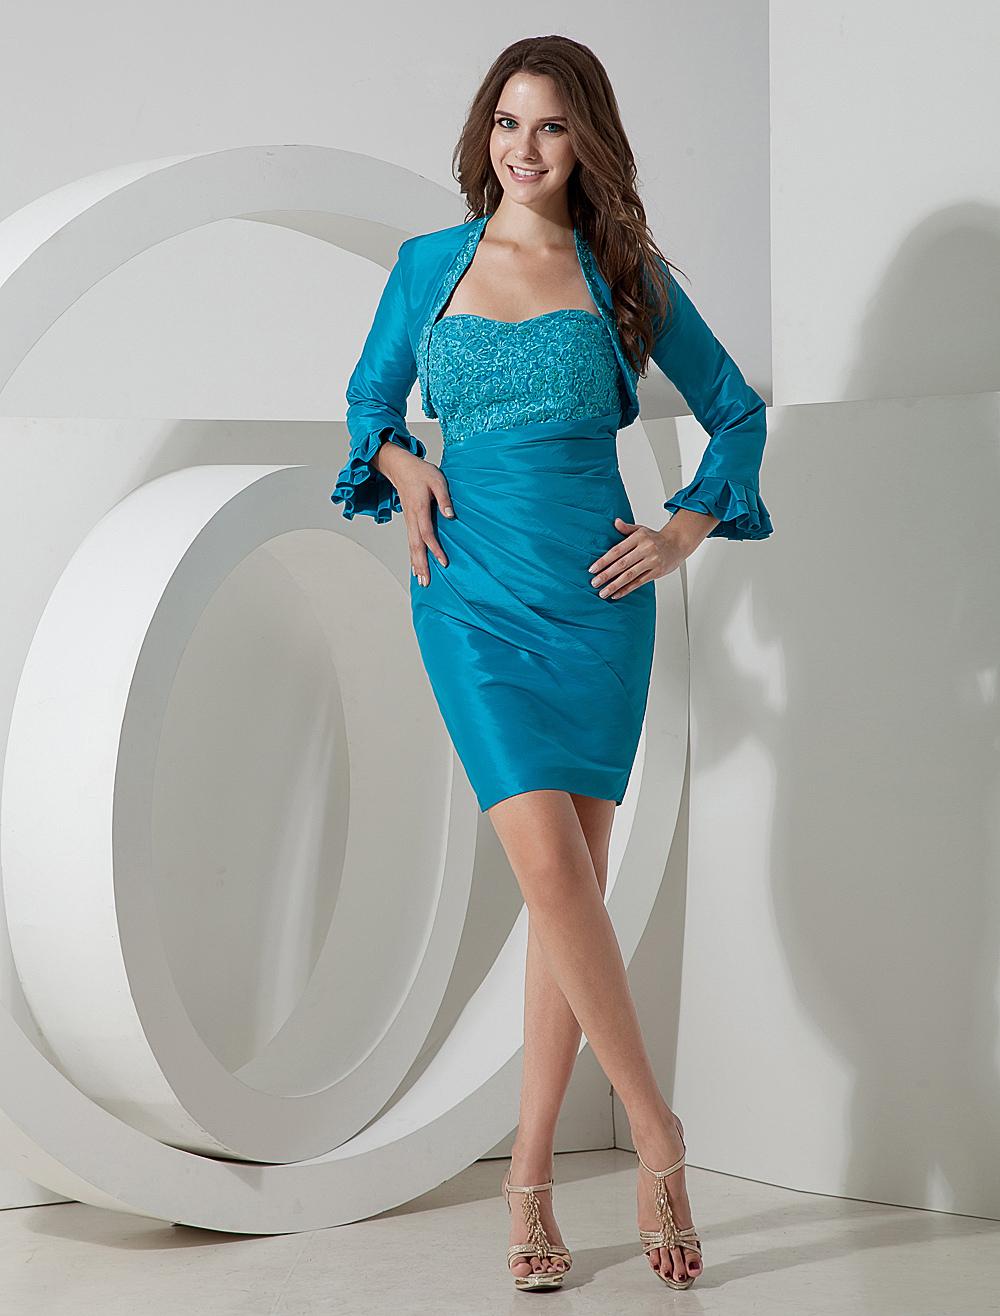 Vestido de coctel azul turquesa